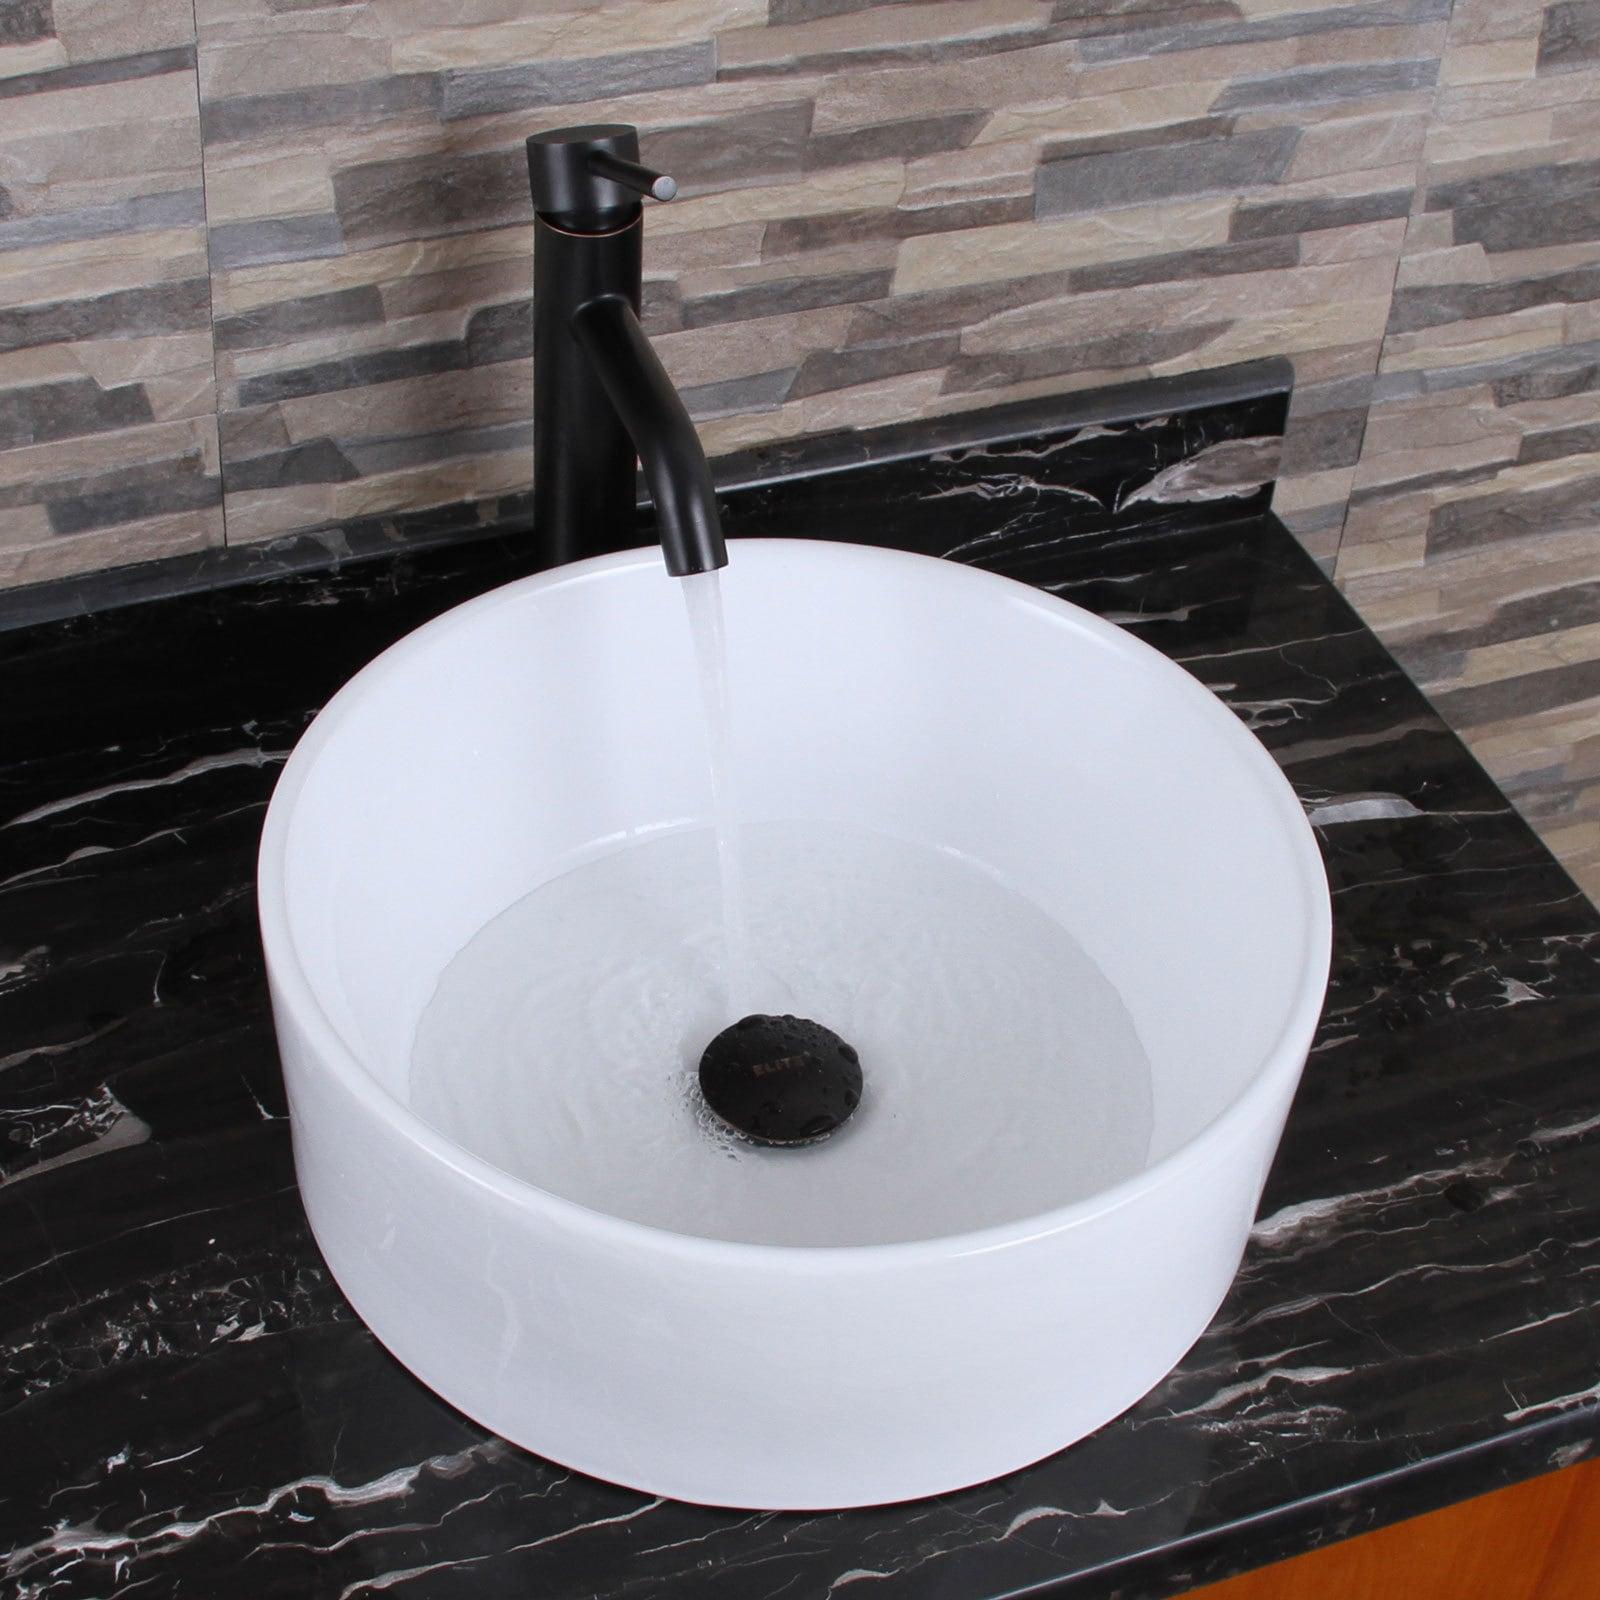 Elite Elimax 04 Round Shape White Porcelain Ceramic Bathroom Vessel ...